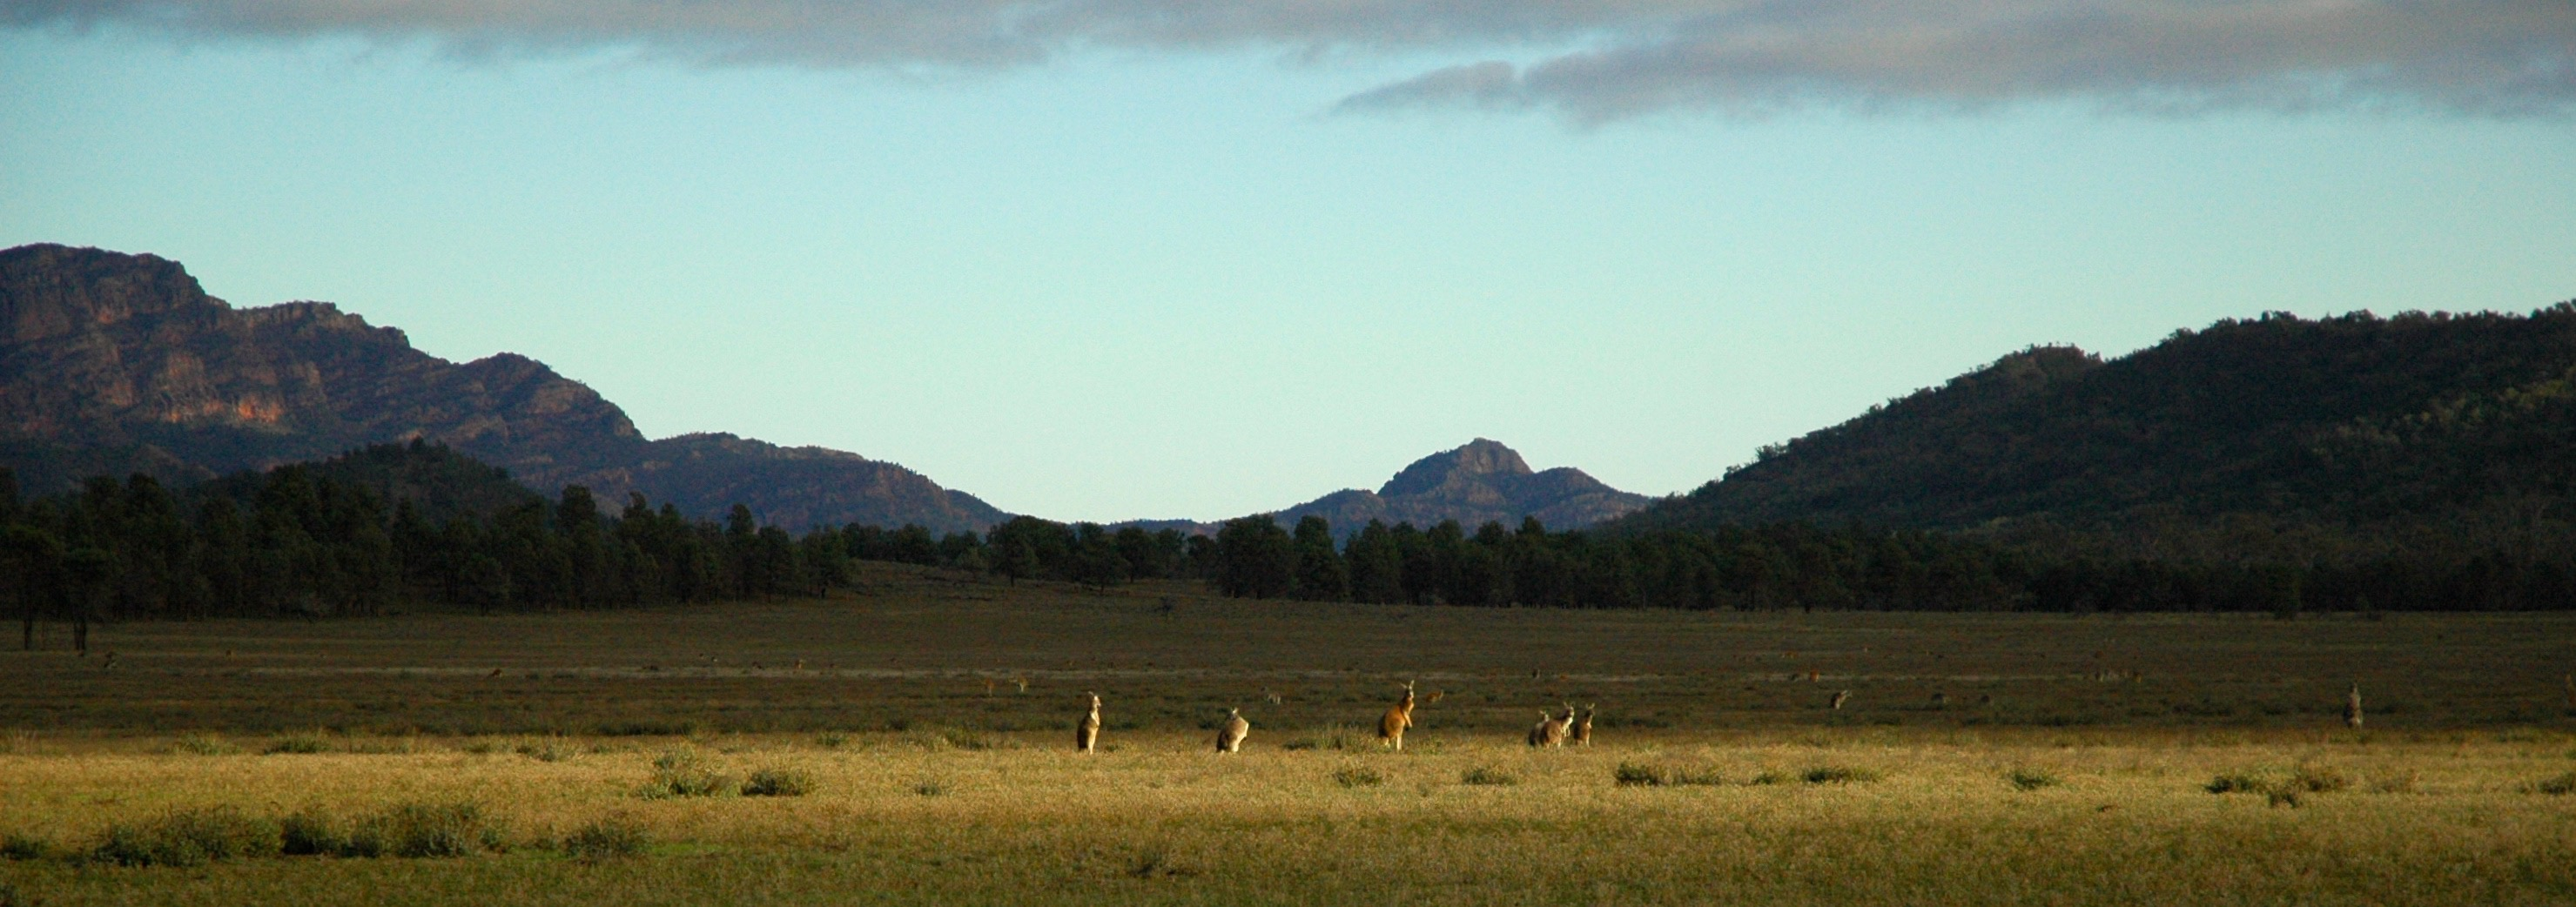 Kangaroos grazing near Wilpena Pound in the Flinders Ranges.